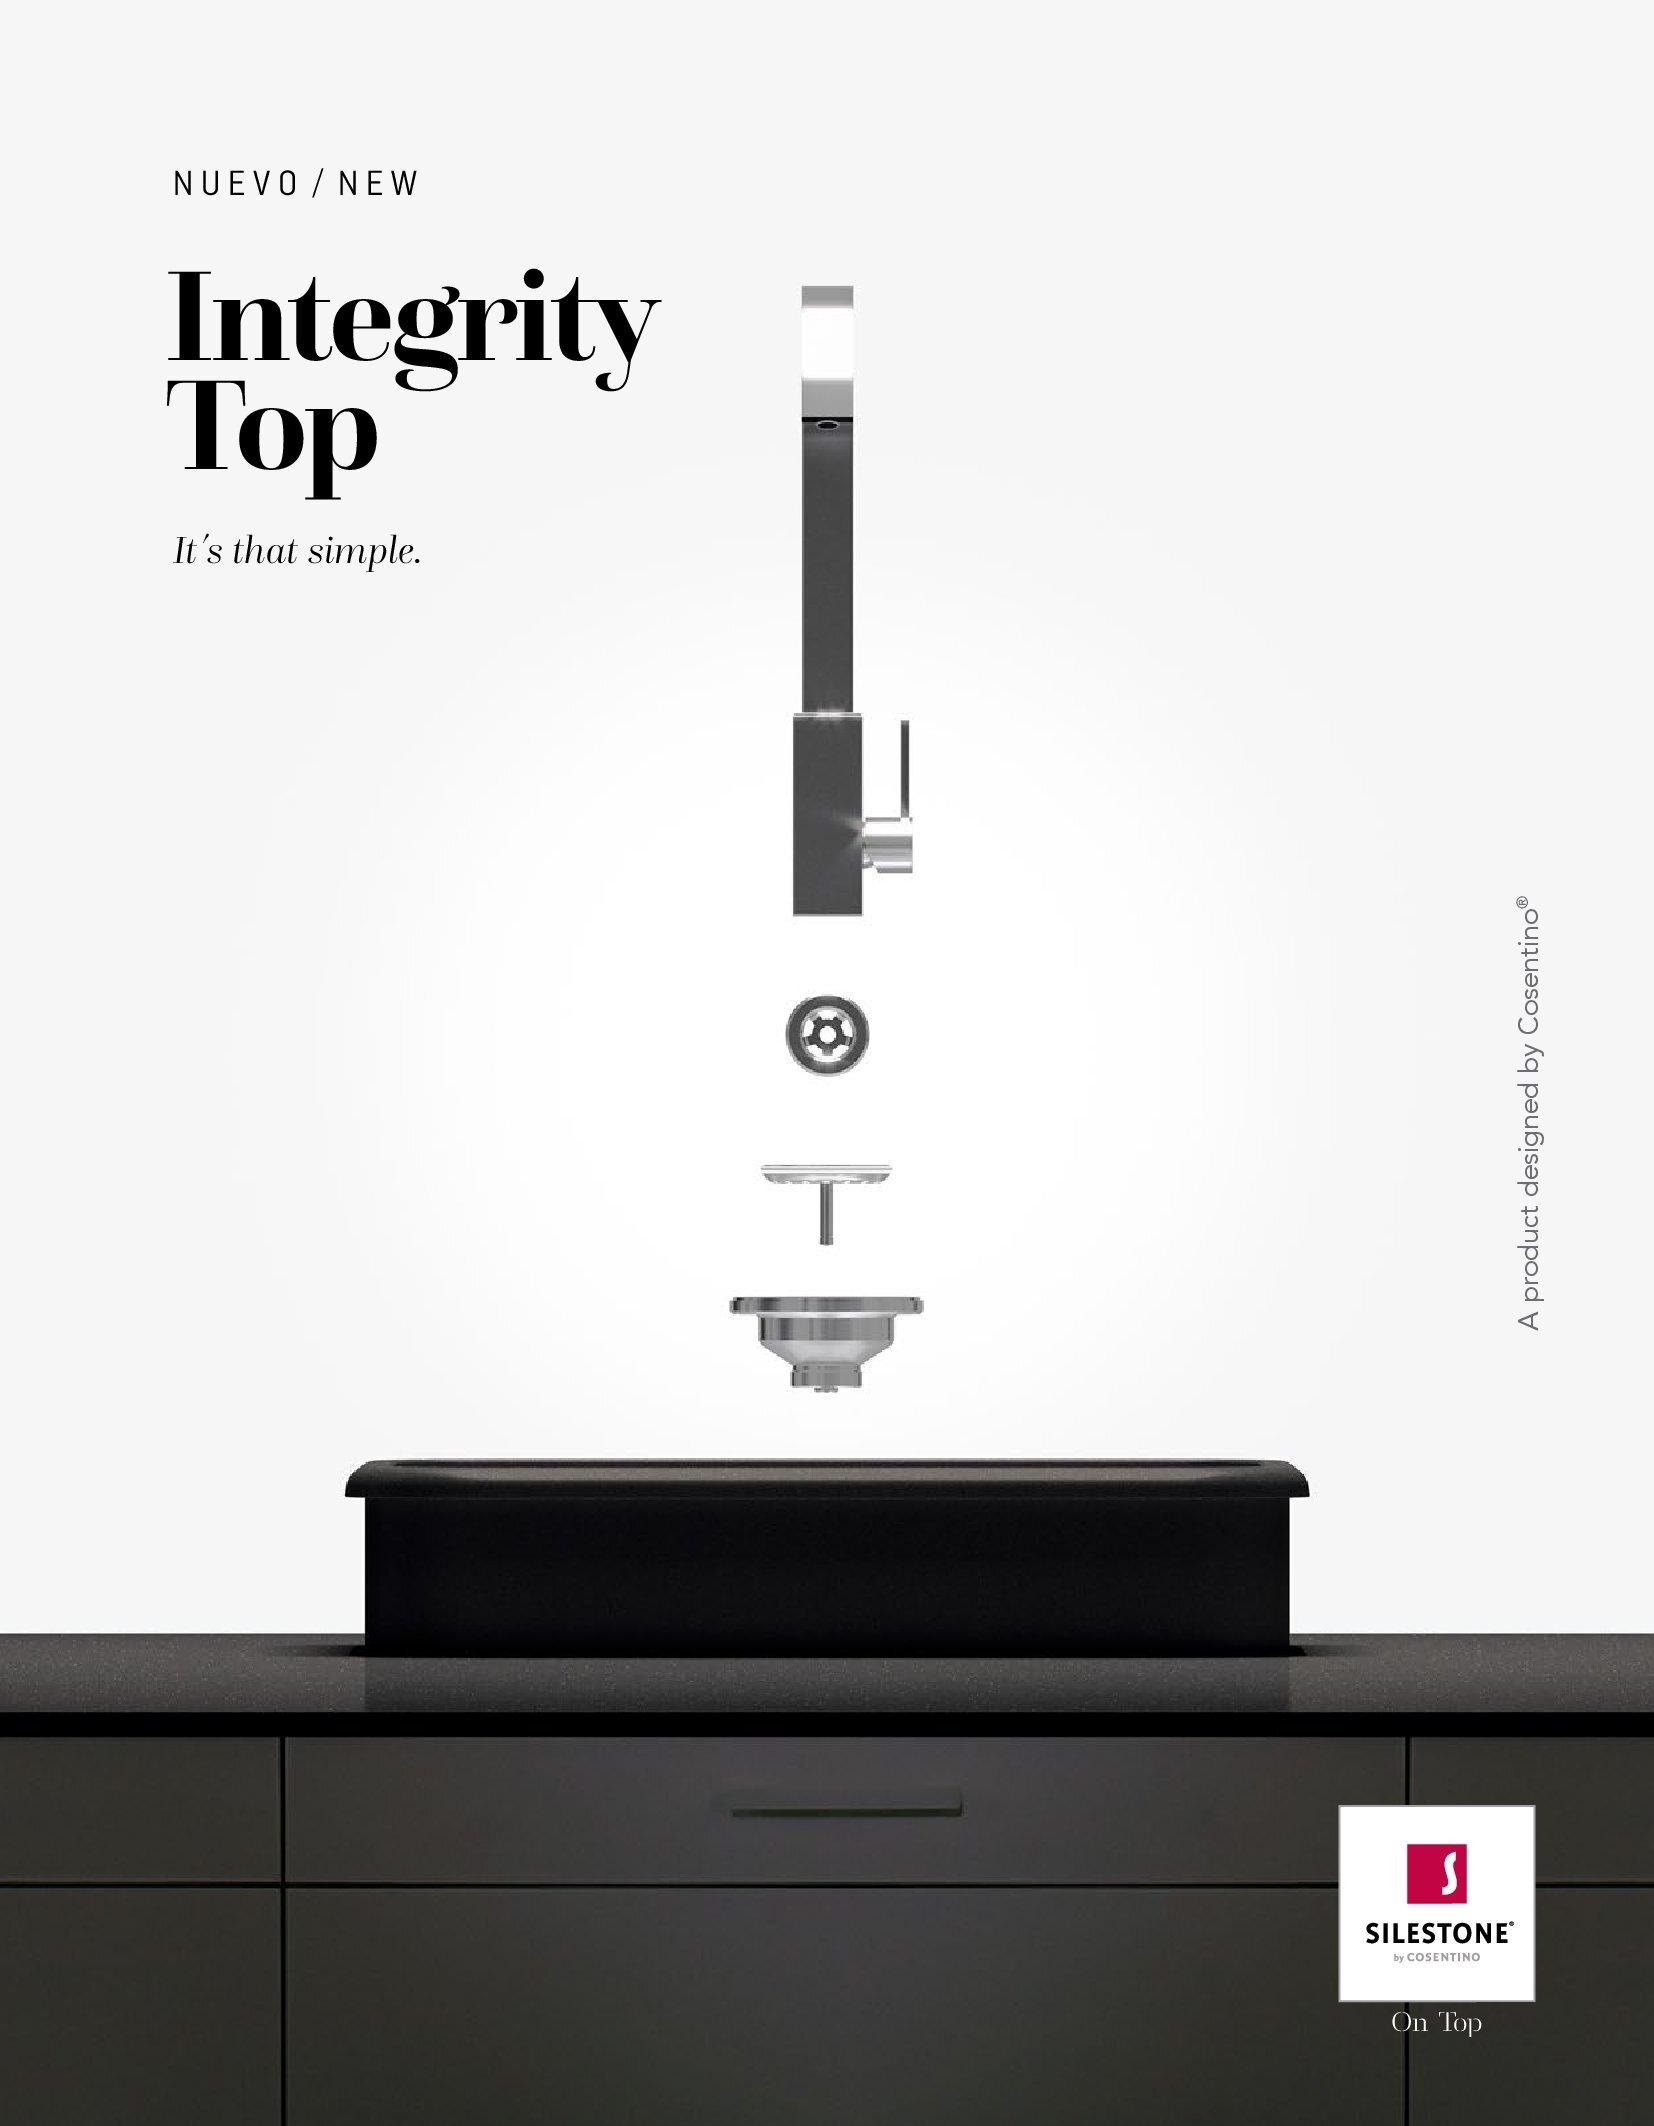 Silestone Integrity Top